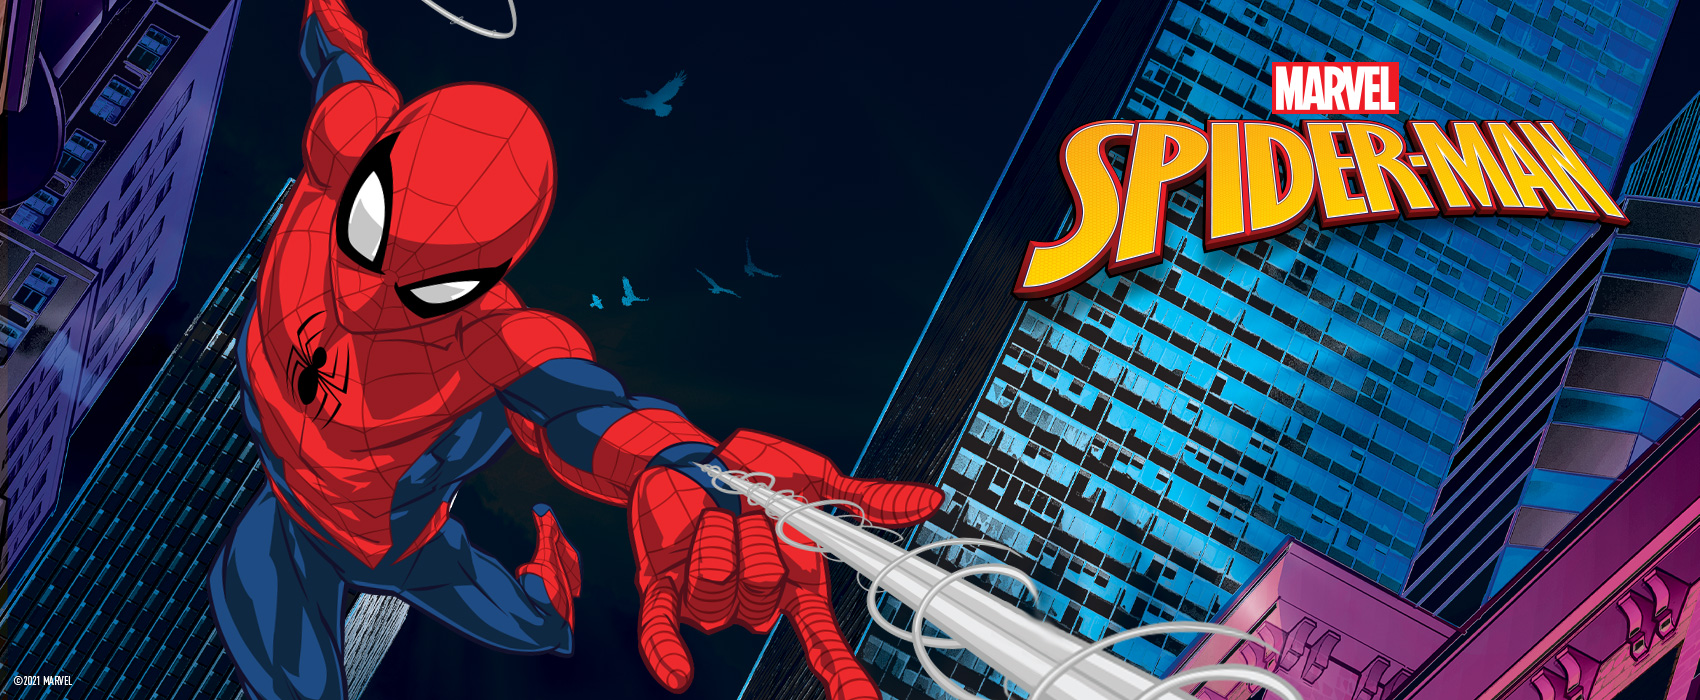 CG2021_Marques_1700x700_Spiderman